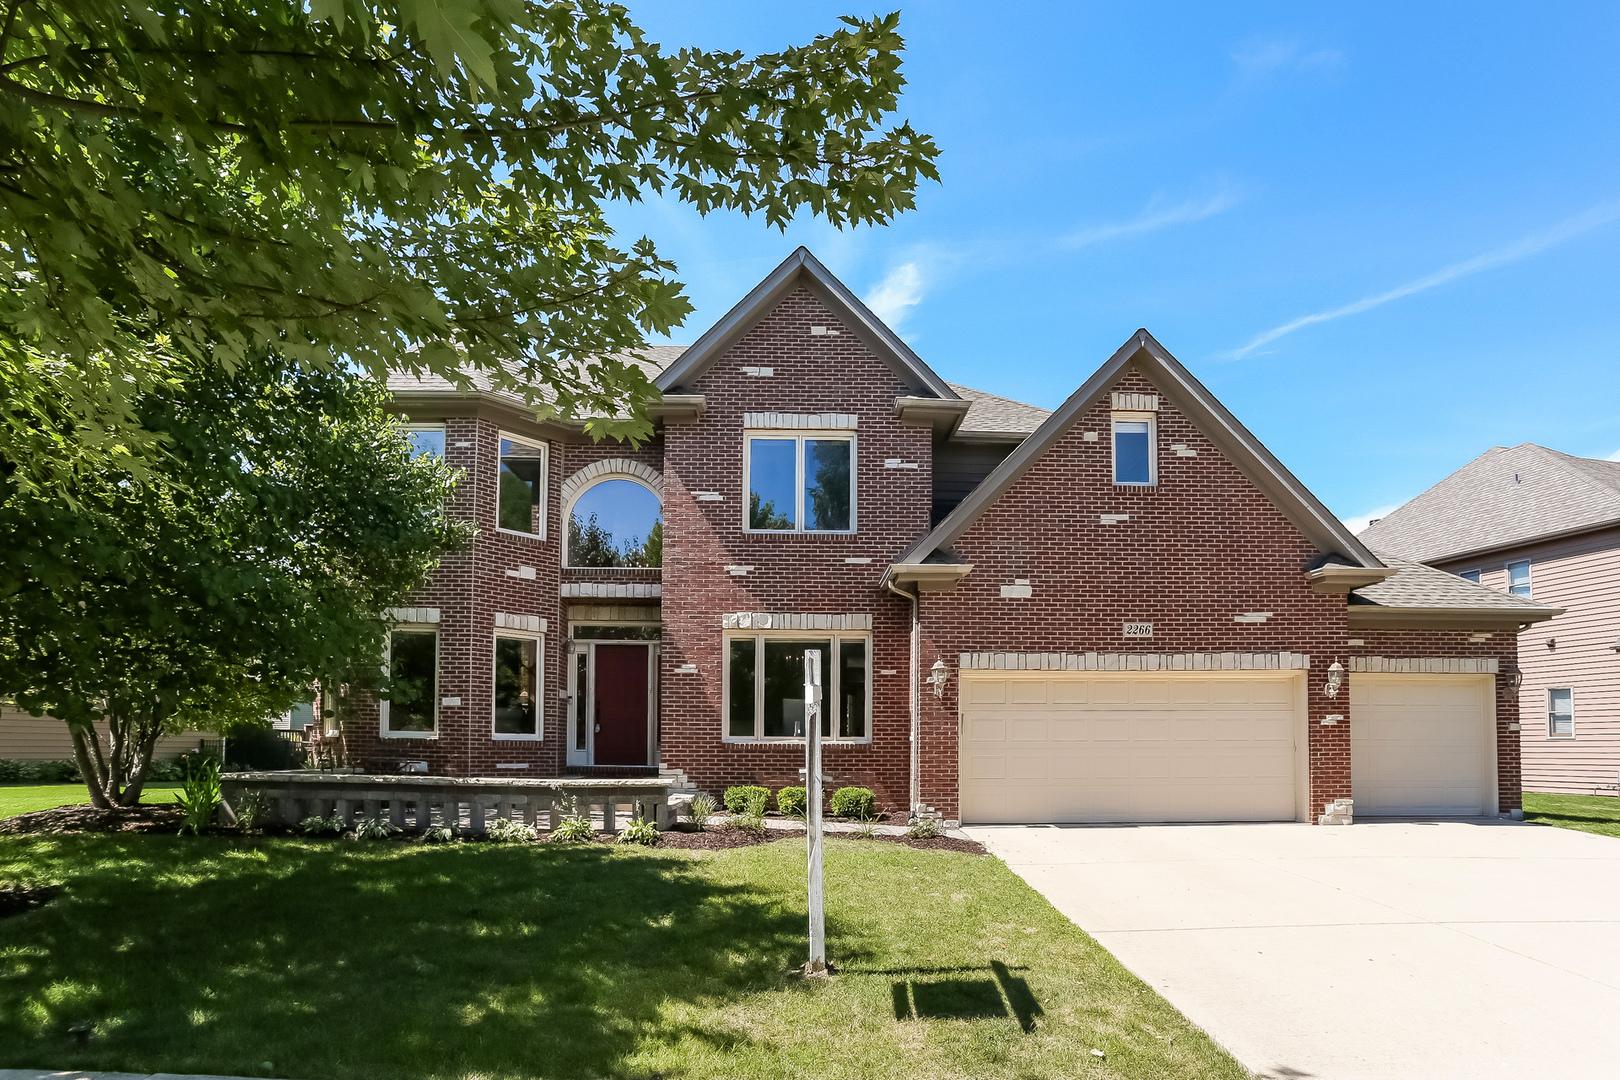 2266 Red Maple, AURORA, Illinois, 60502